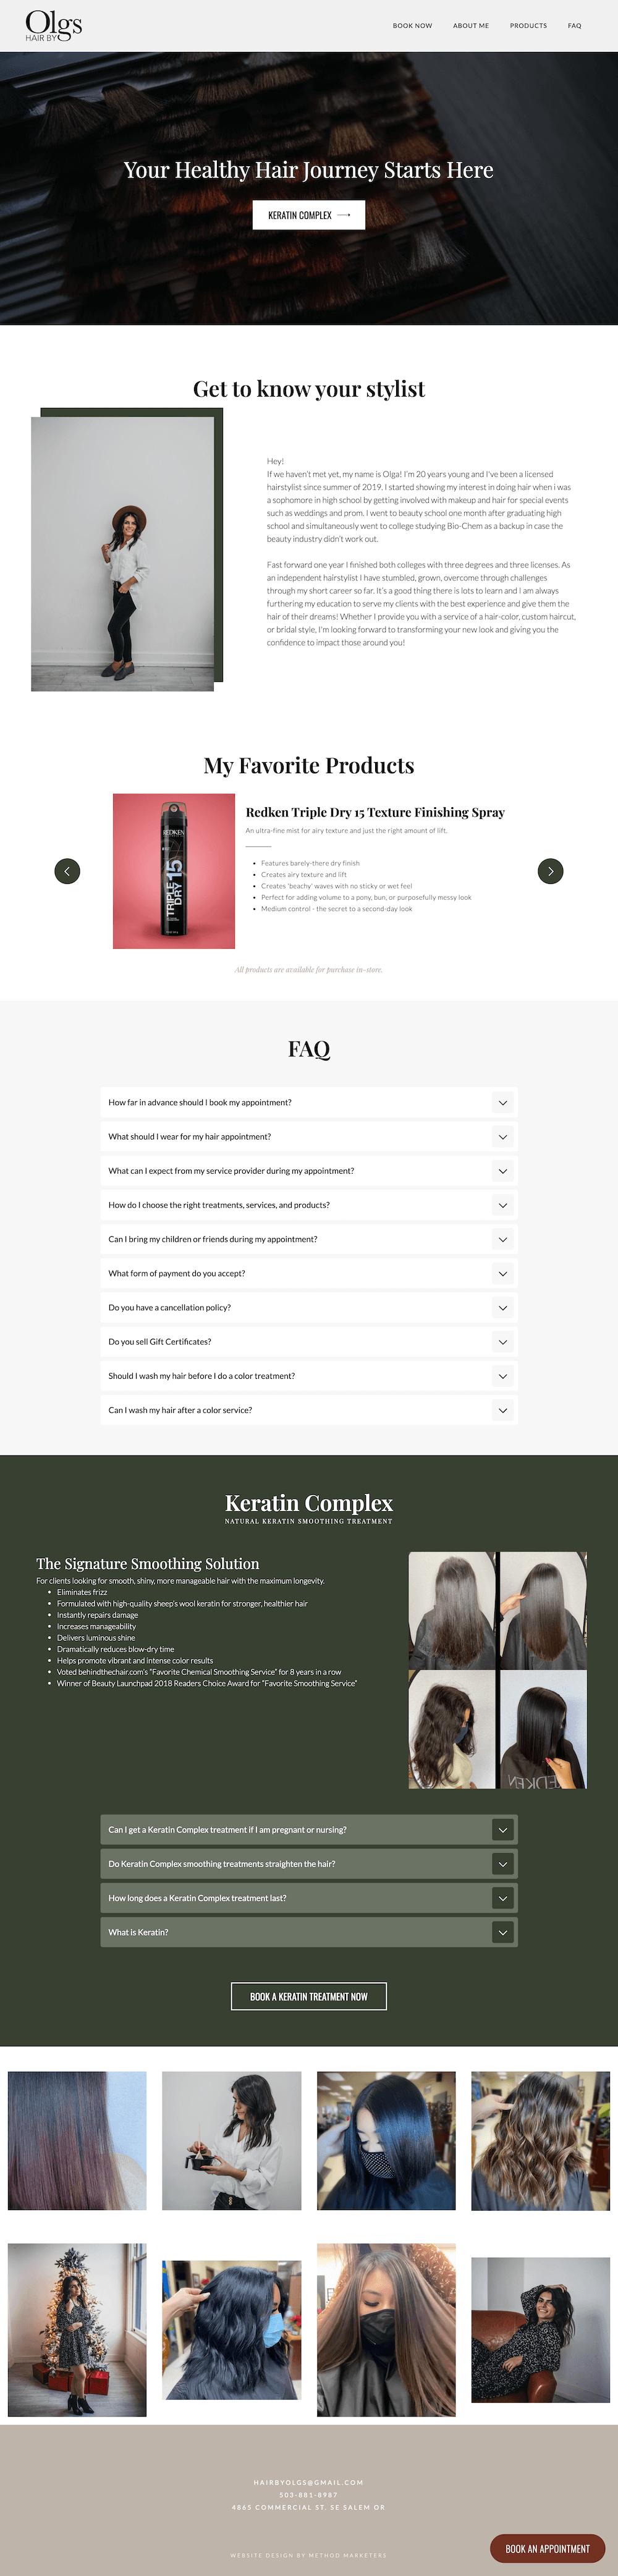 Oregon Web Design